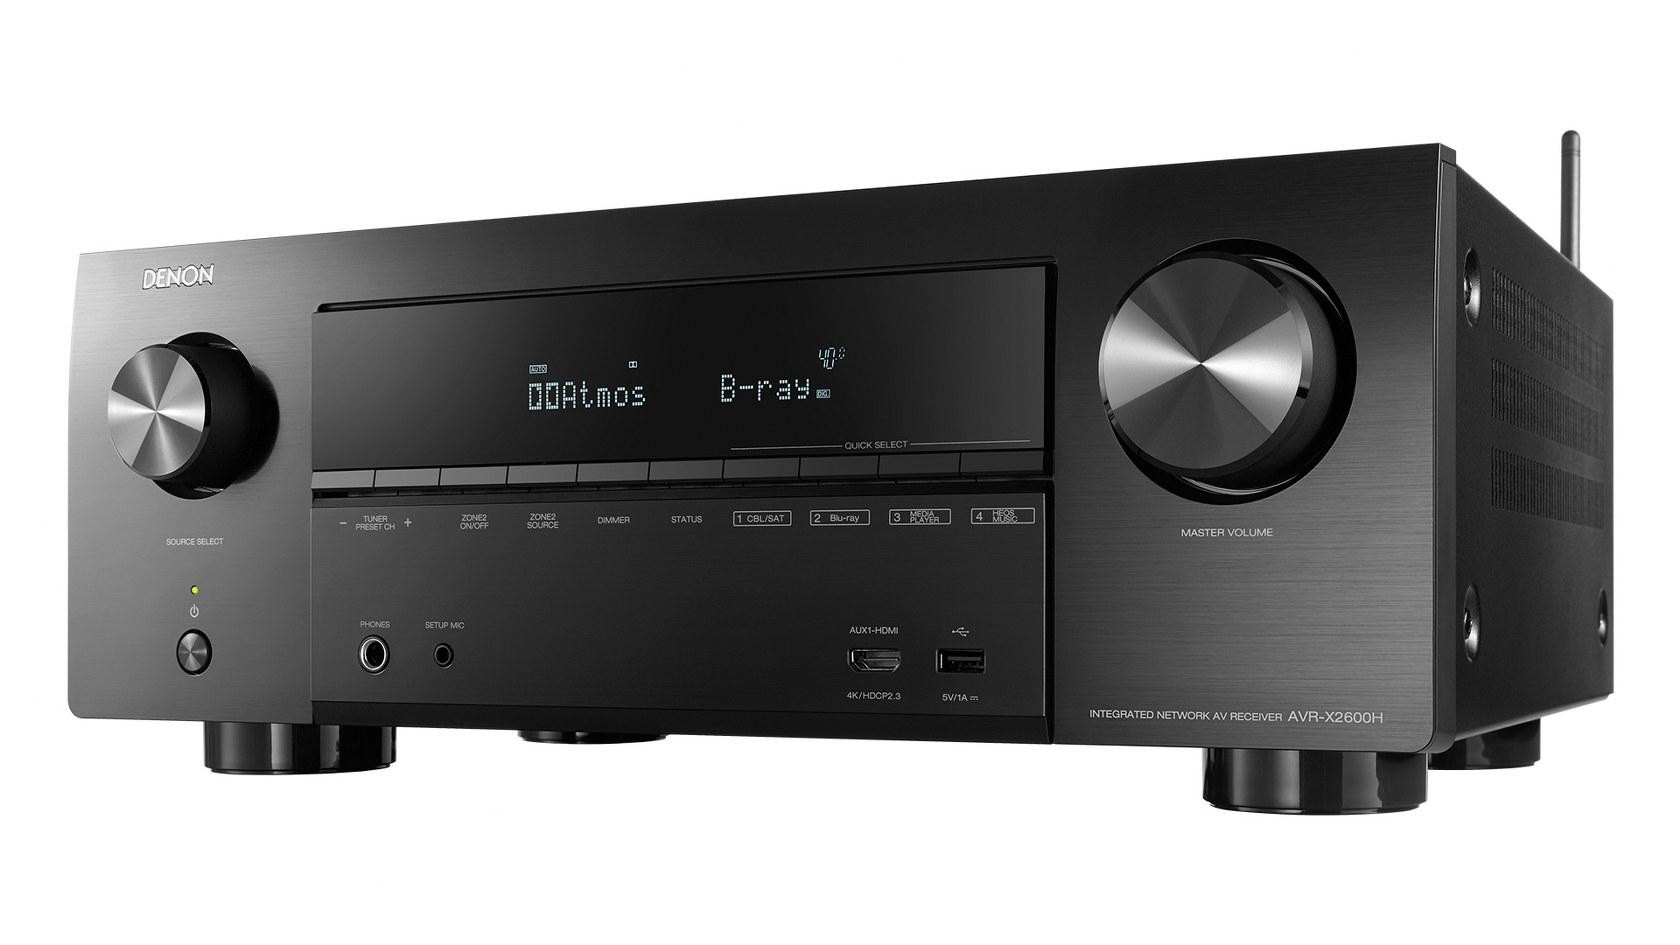 Denon AVR-X2600H 7 2 Channel 4K HD AV Receiver